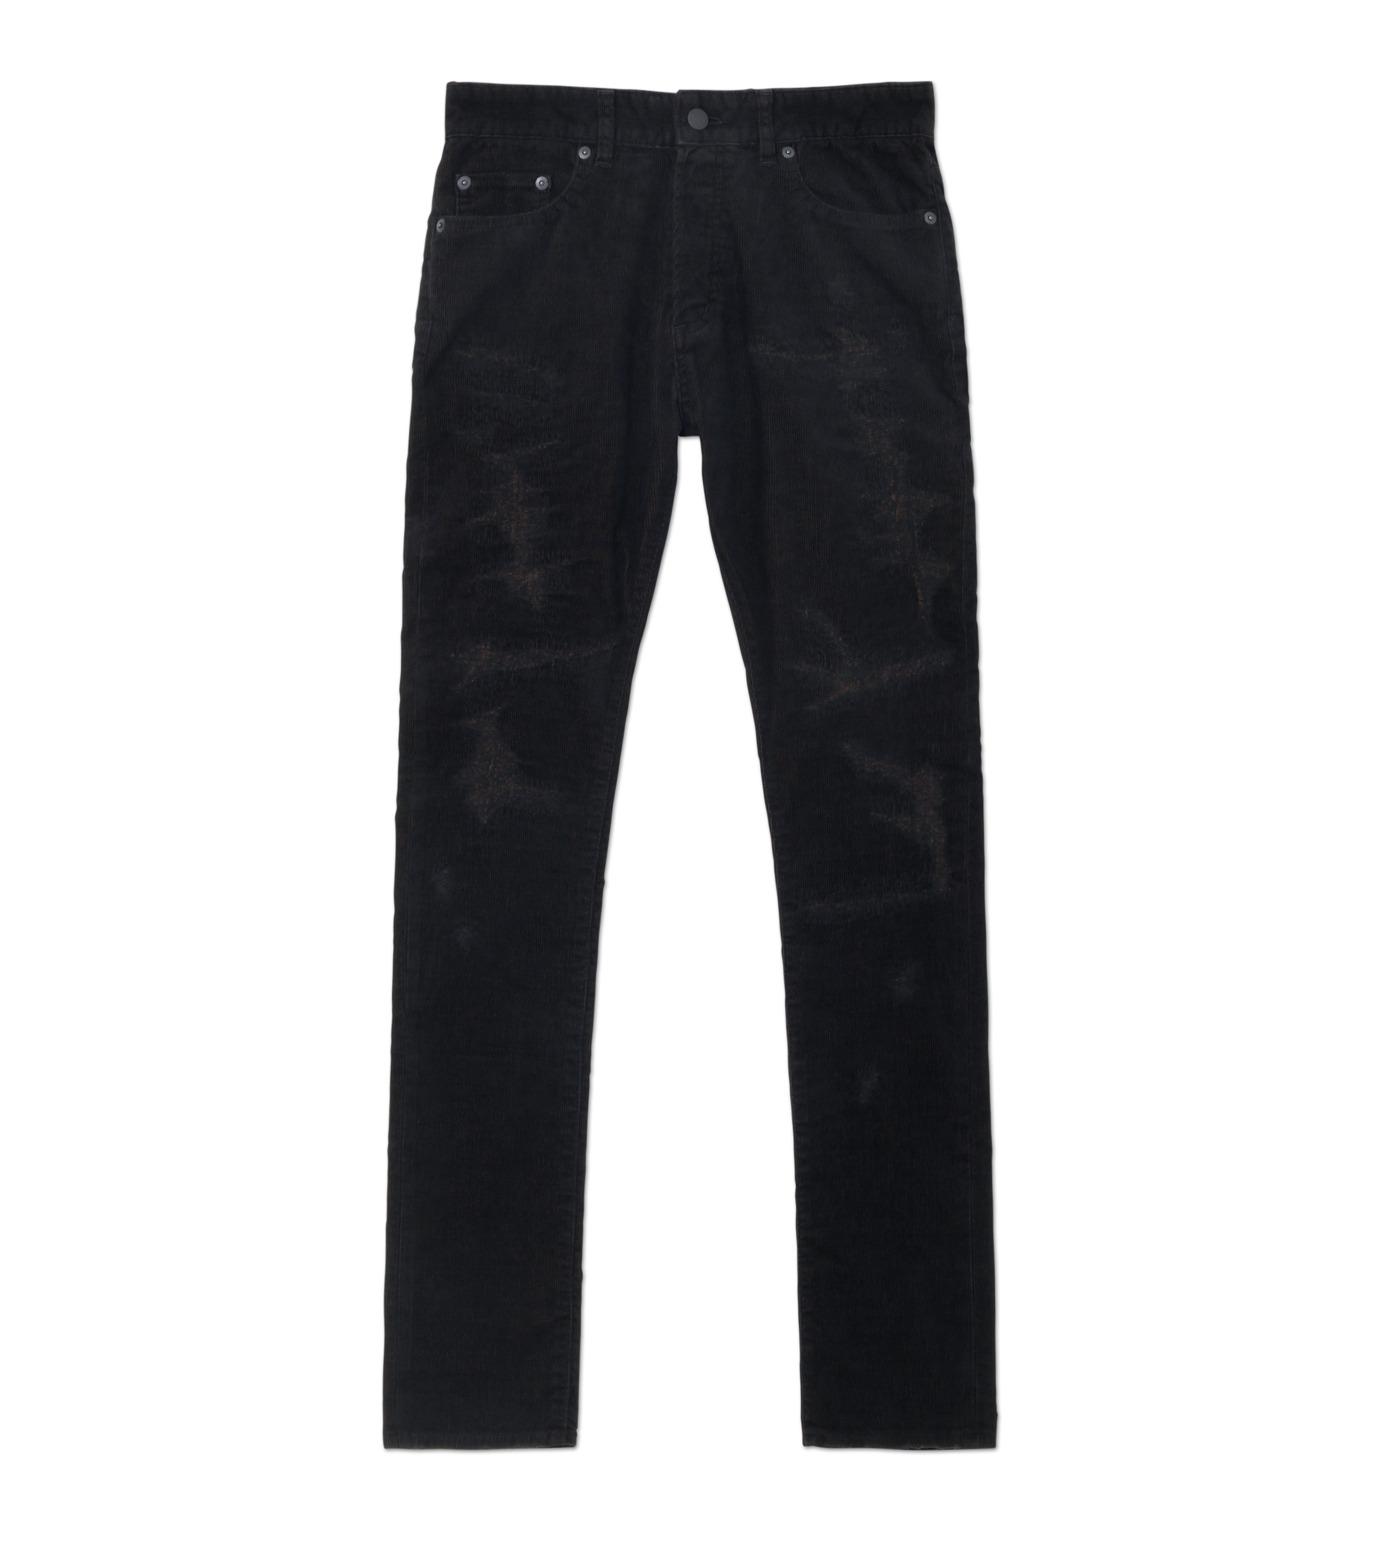 HL HEDDIE LOVU(エイチエル・エディールーヴ)のBLACK CORDUROY DAMAGE PANTS-BLACK(パンツ/pants)-18A98001-13 拡大詳細画像1